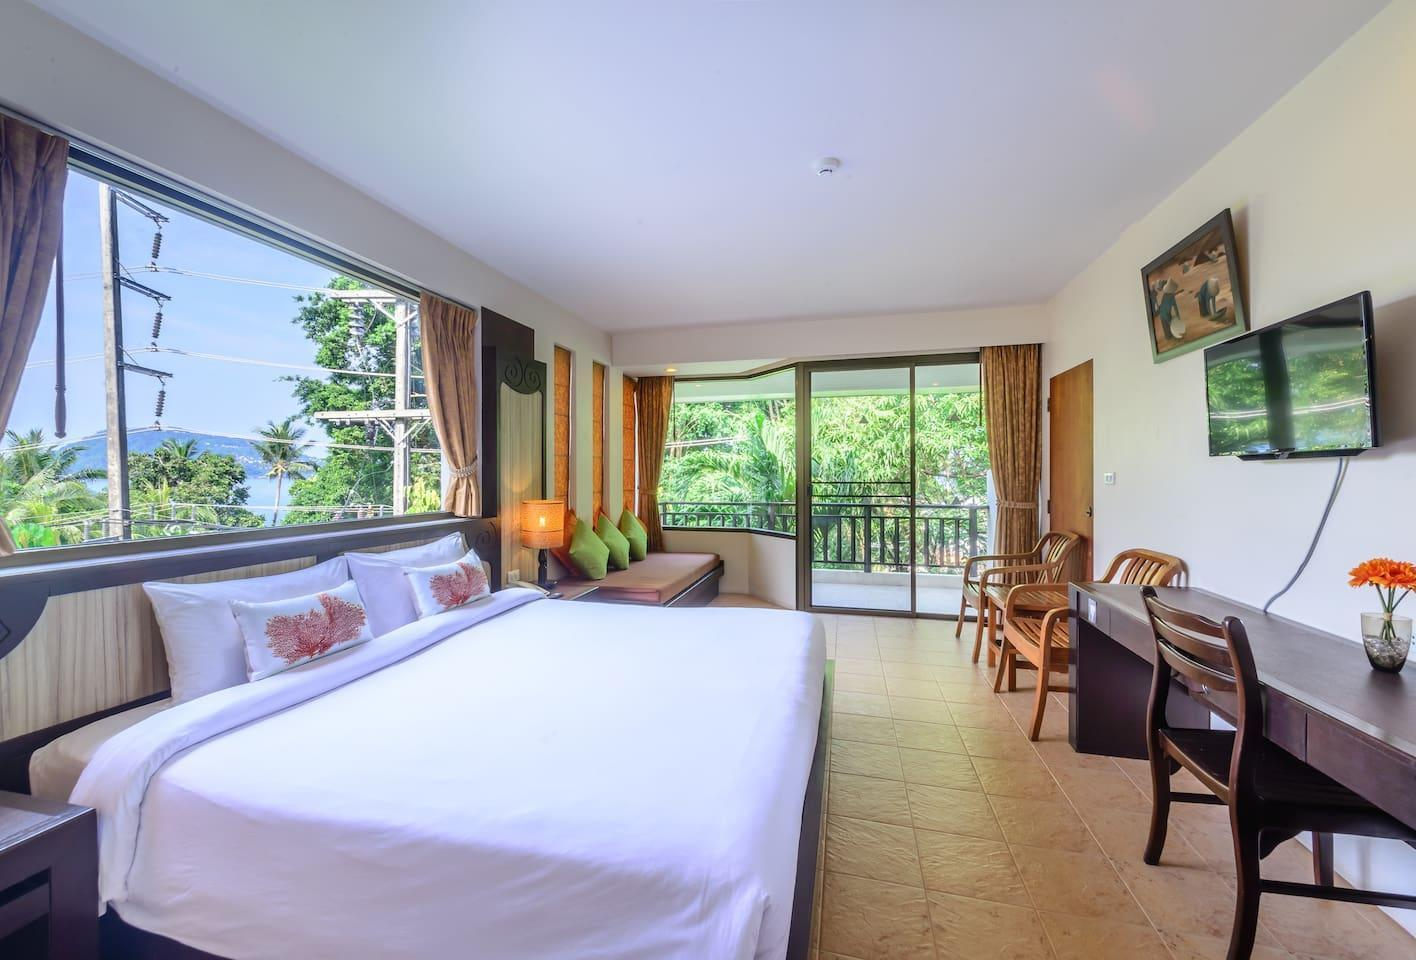 Deluxe Corner Room@Patong Lodge Hotel, Phuket. 1 ห้องนอน 1 ห้องน้ำส่วนตัว ขนาด 40 ตร.ม. – ป่าตอง